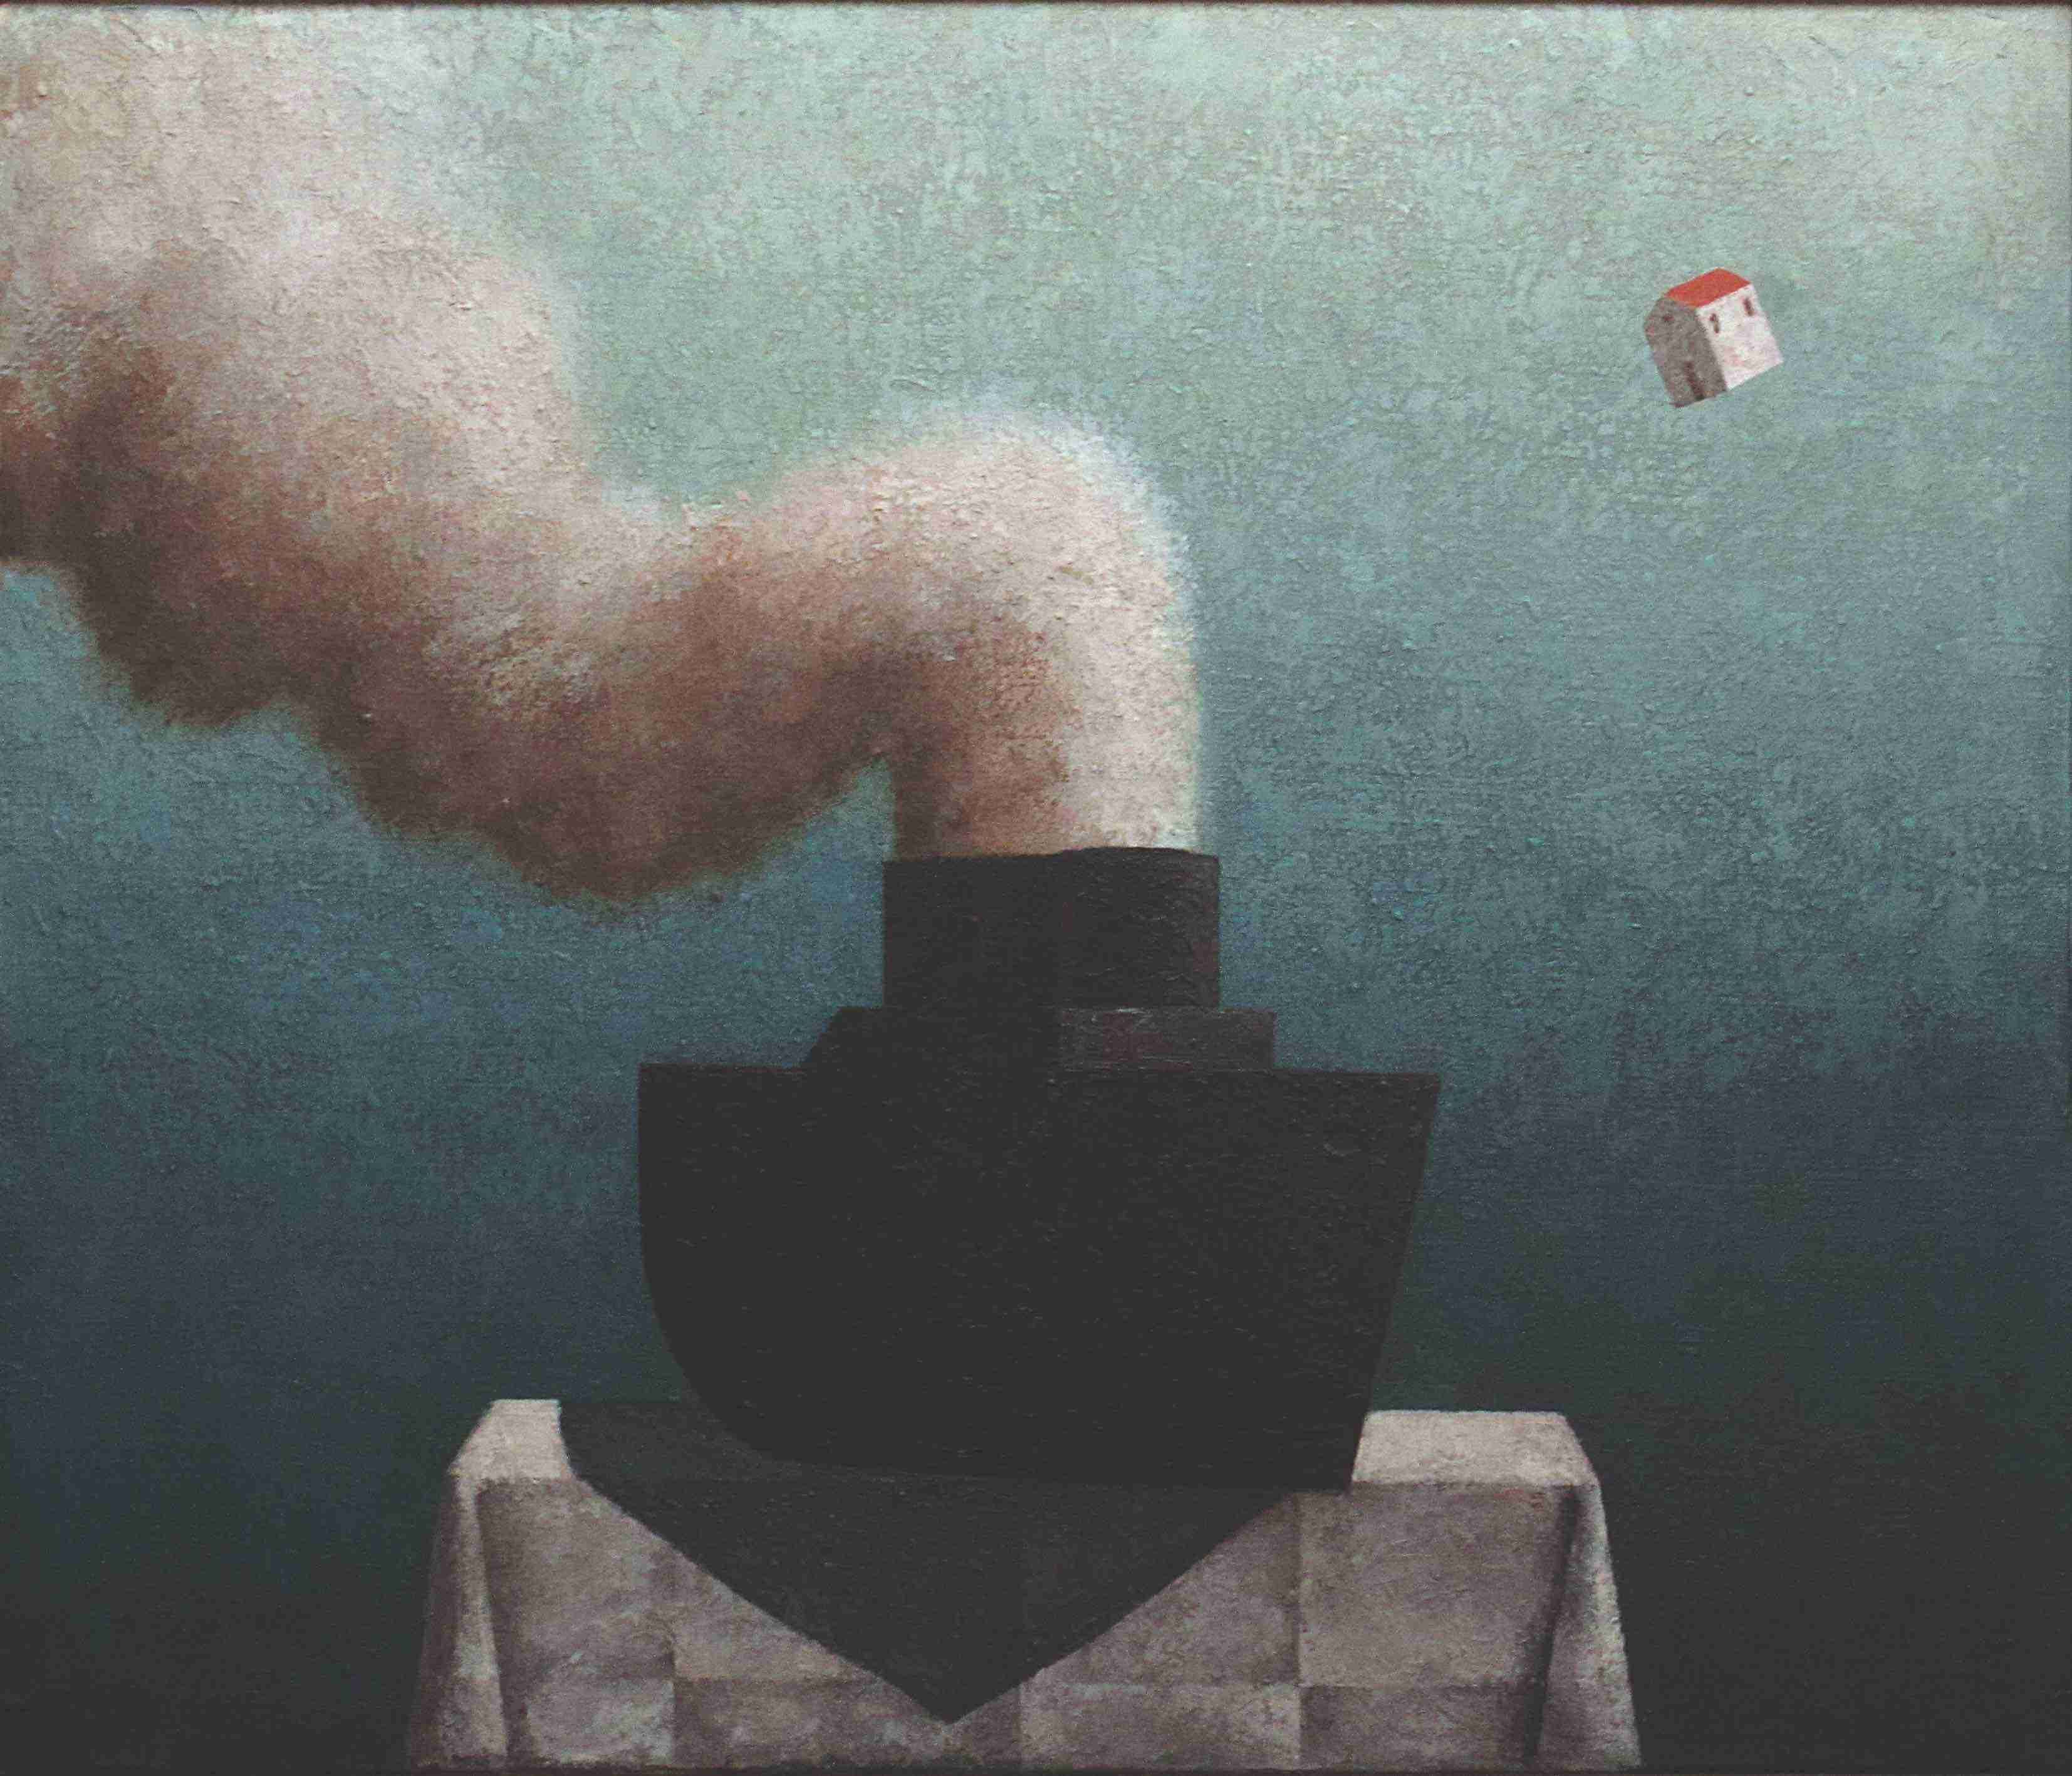 Brandes, Matthias: Steamboat